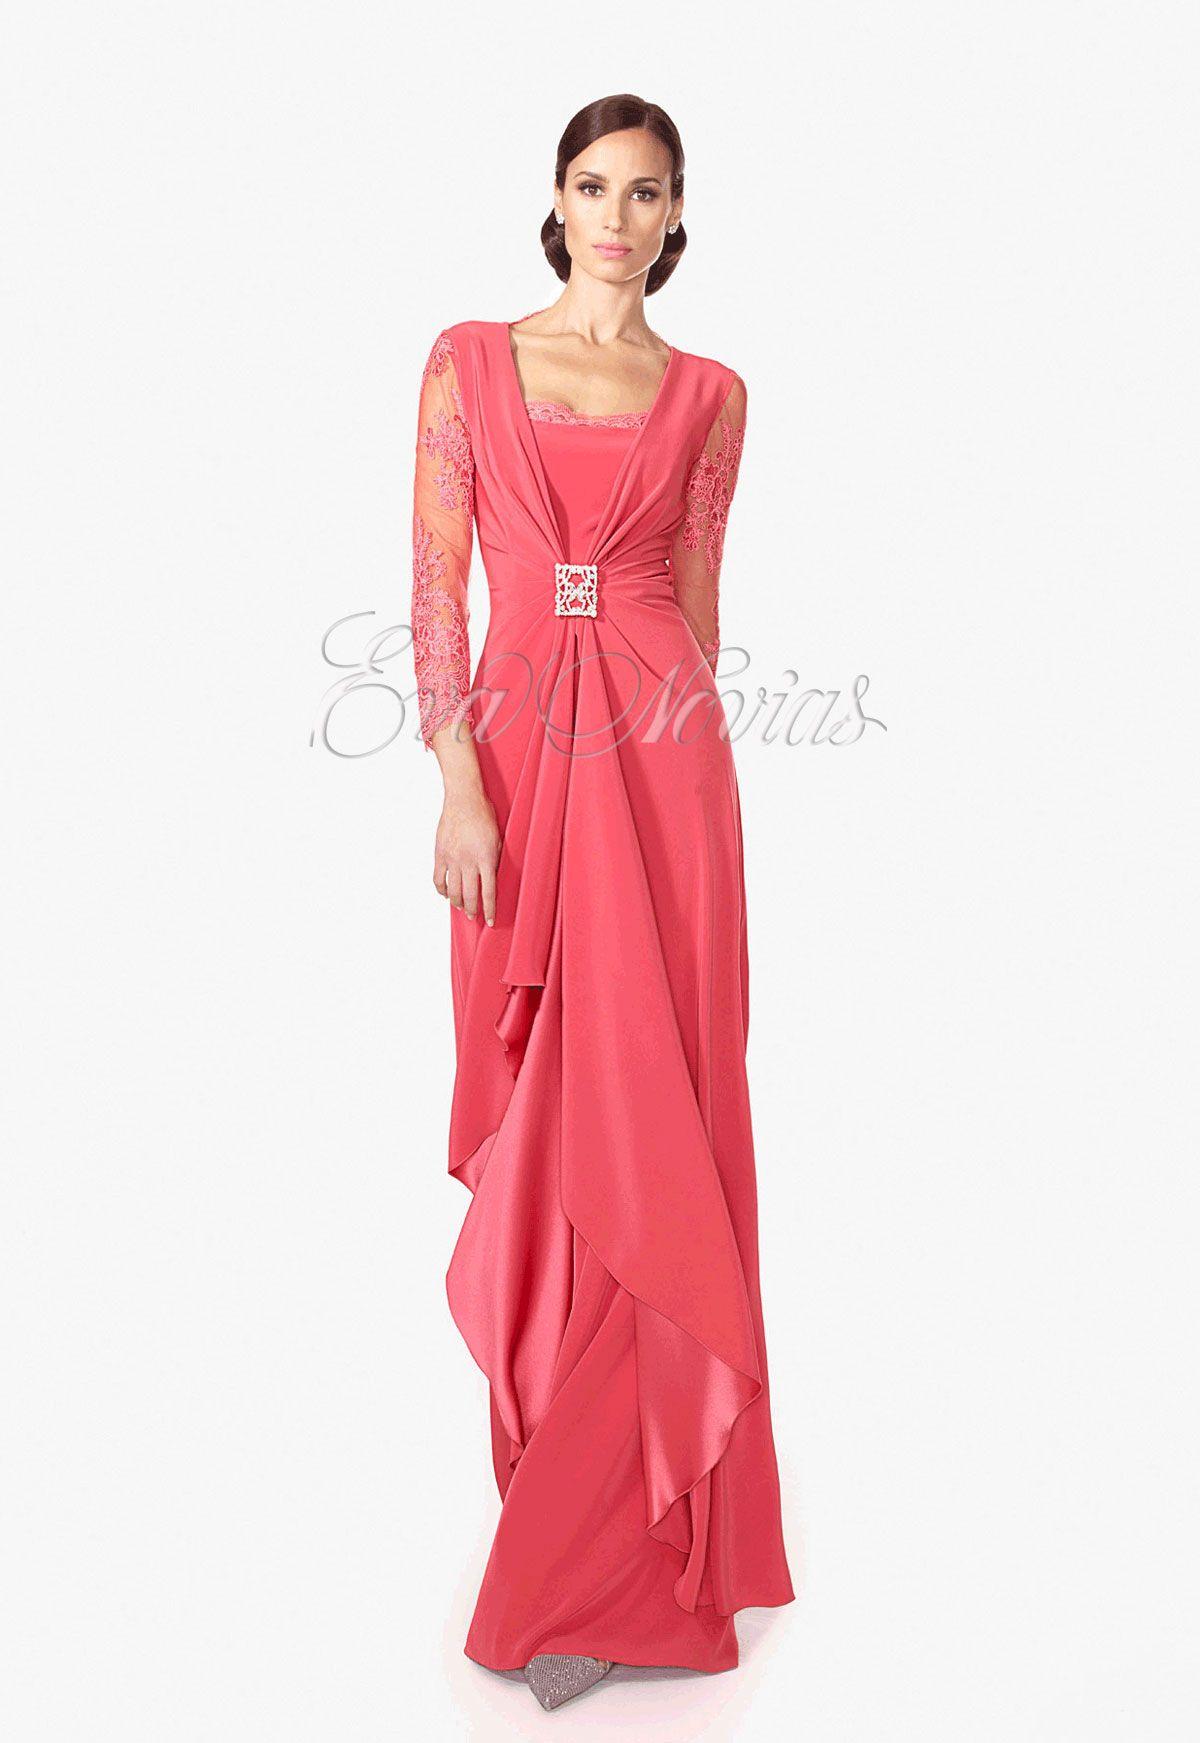 d65d2d78da Vestido de fiesta y madrina de Patricia Avendaño colección 2016 modelo 1958  en Eva Novias Madrid calle Goya